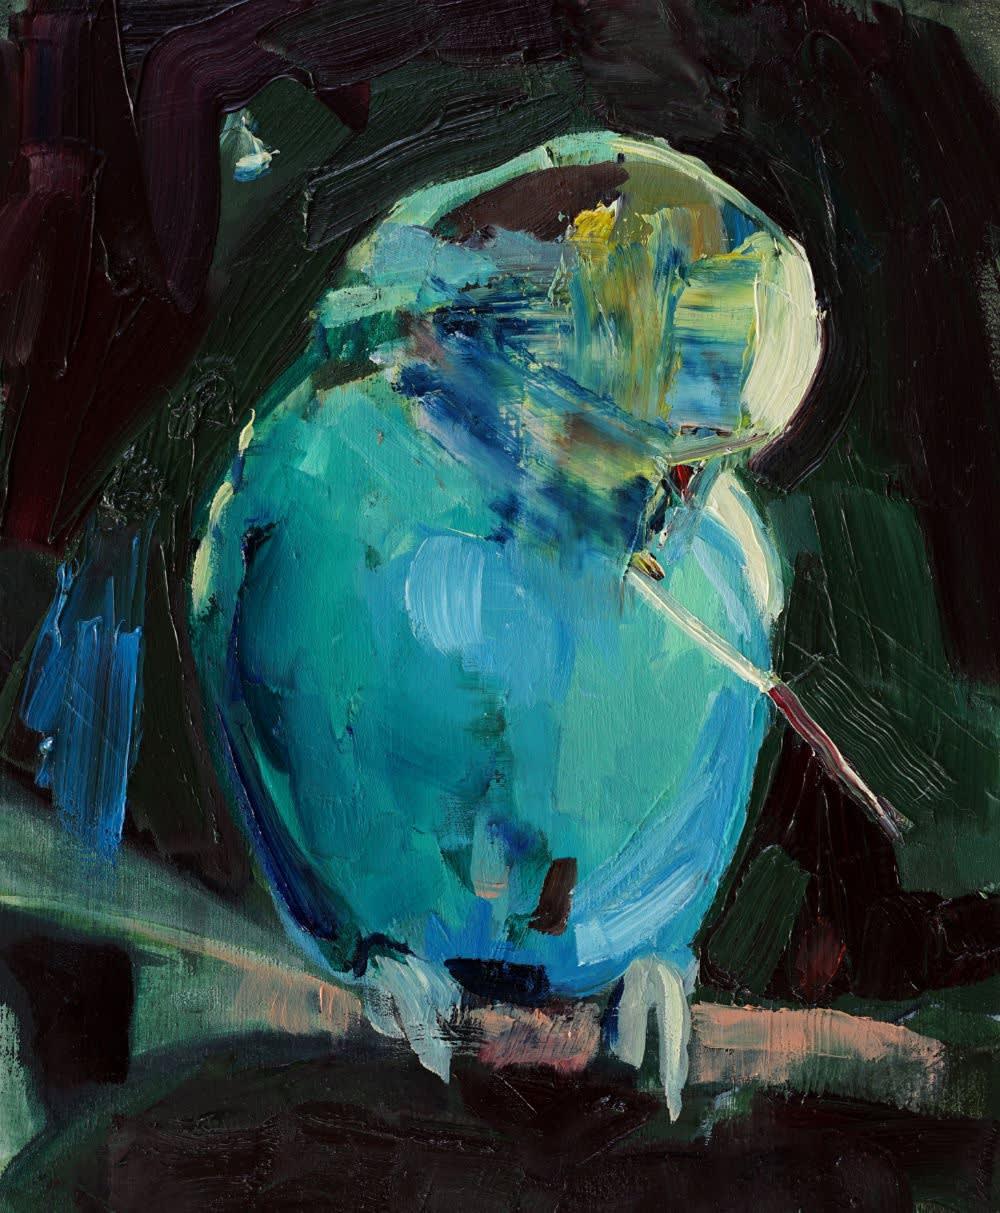 ANNA BITTERSOHL - KUGEL UND STAB - 2017 - OIL ON PANEL - 30 X 25 CM